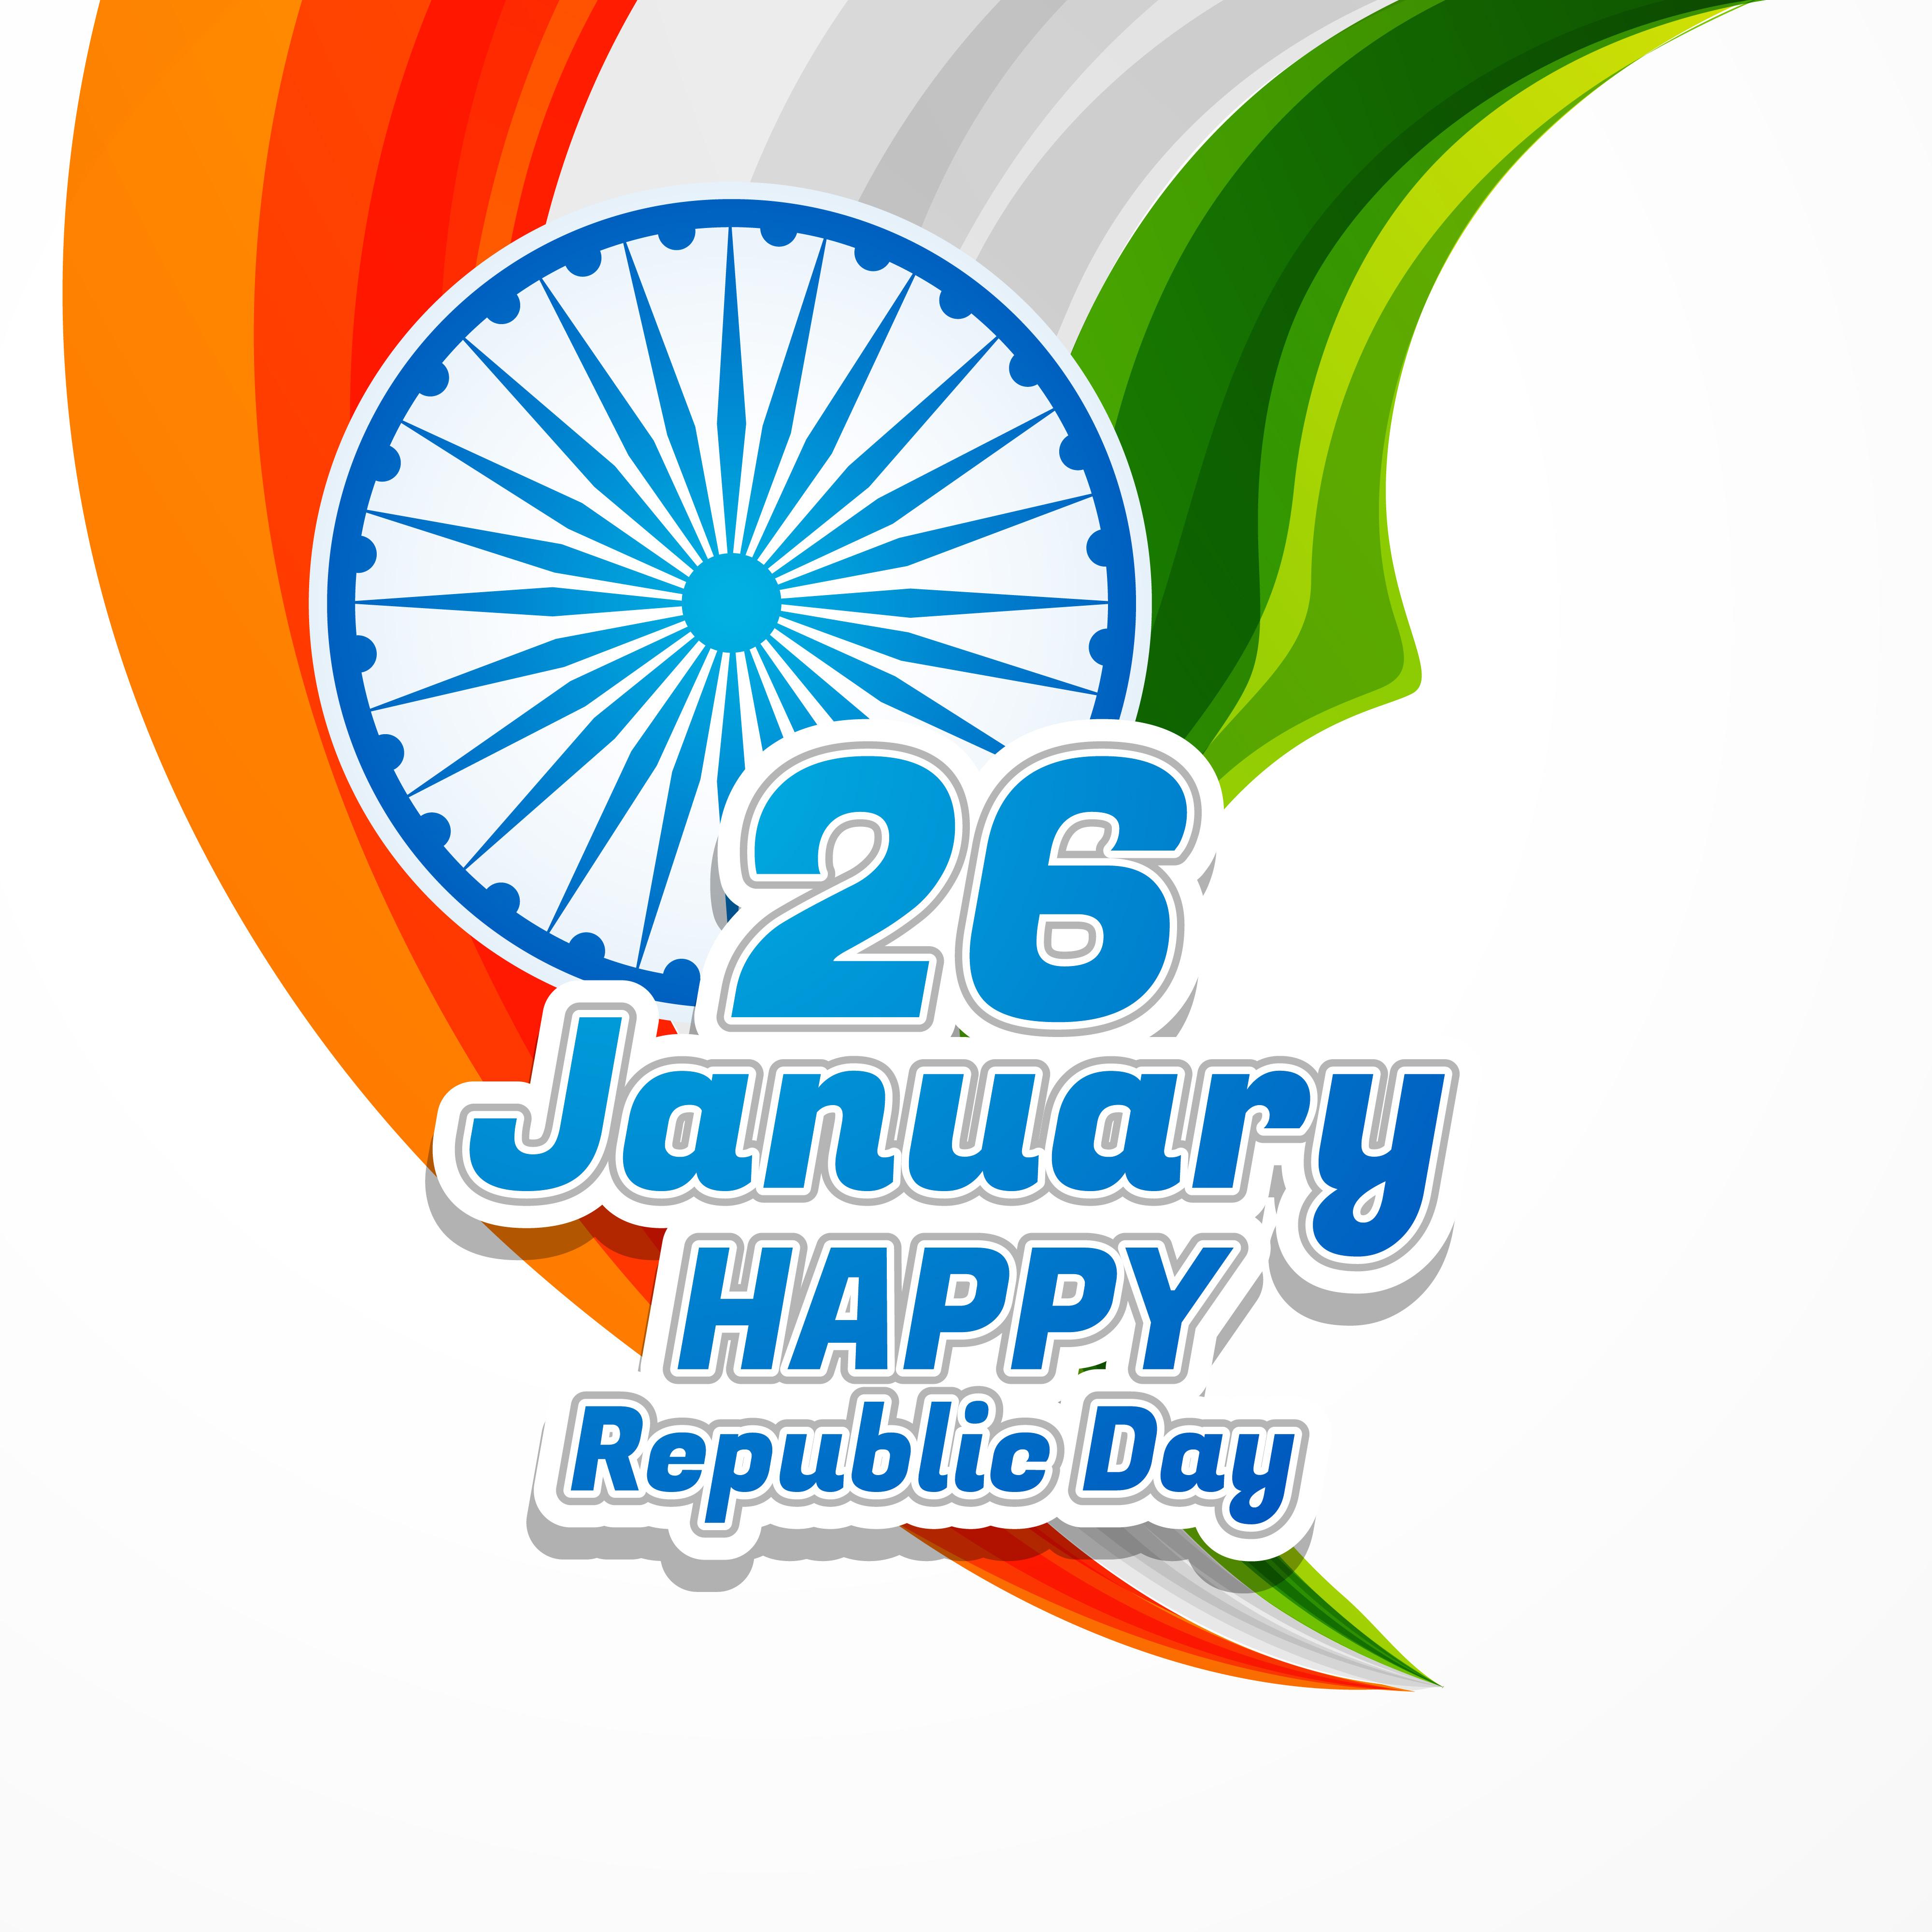 Happy republic day poster vector design illustration for Design republic